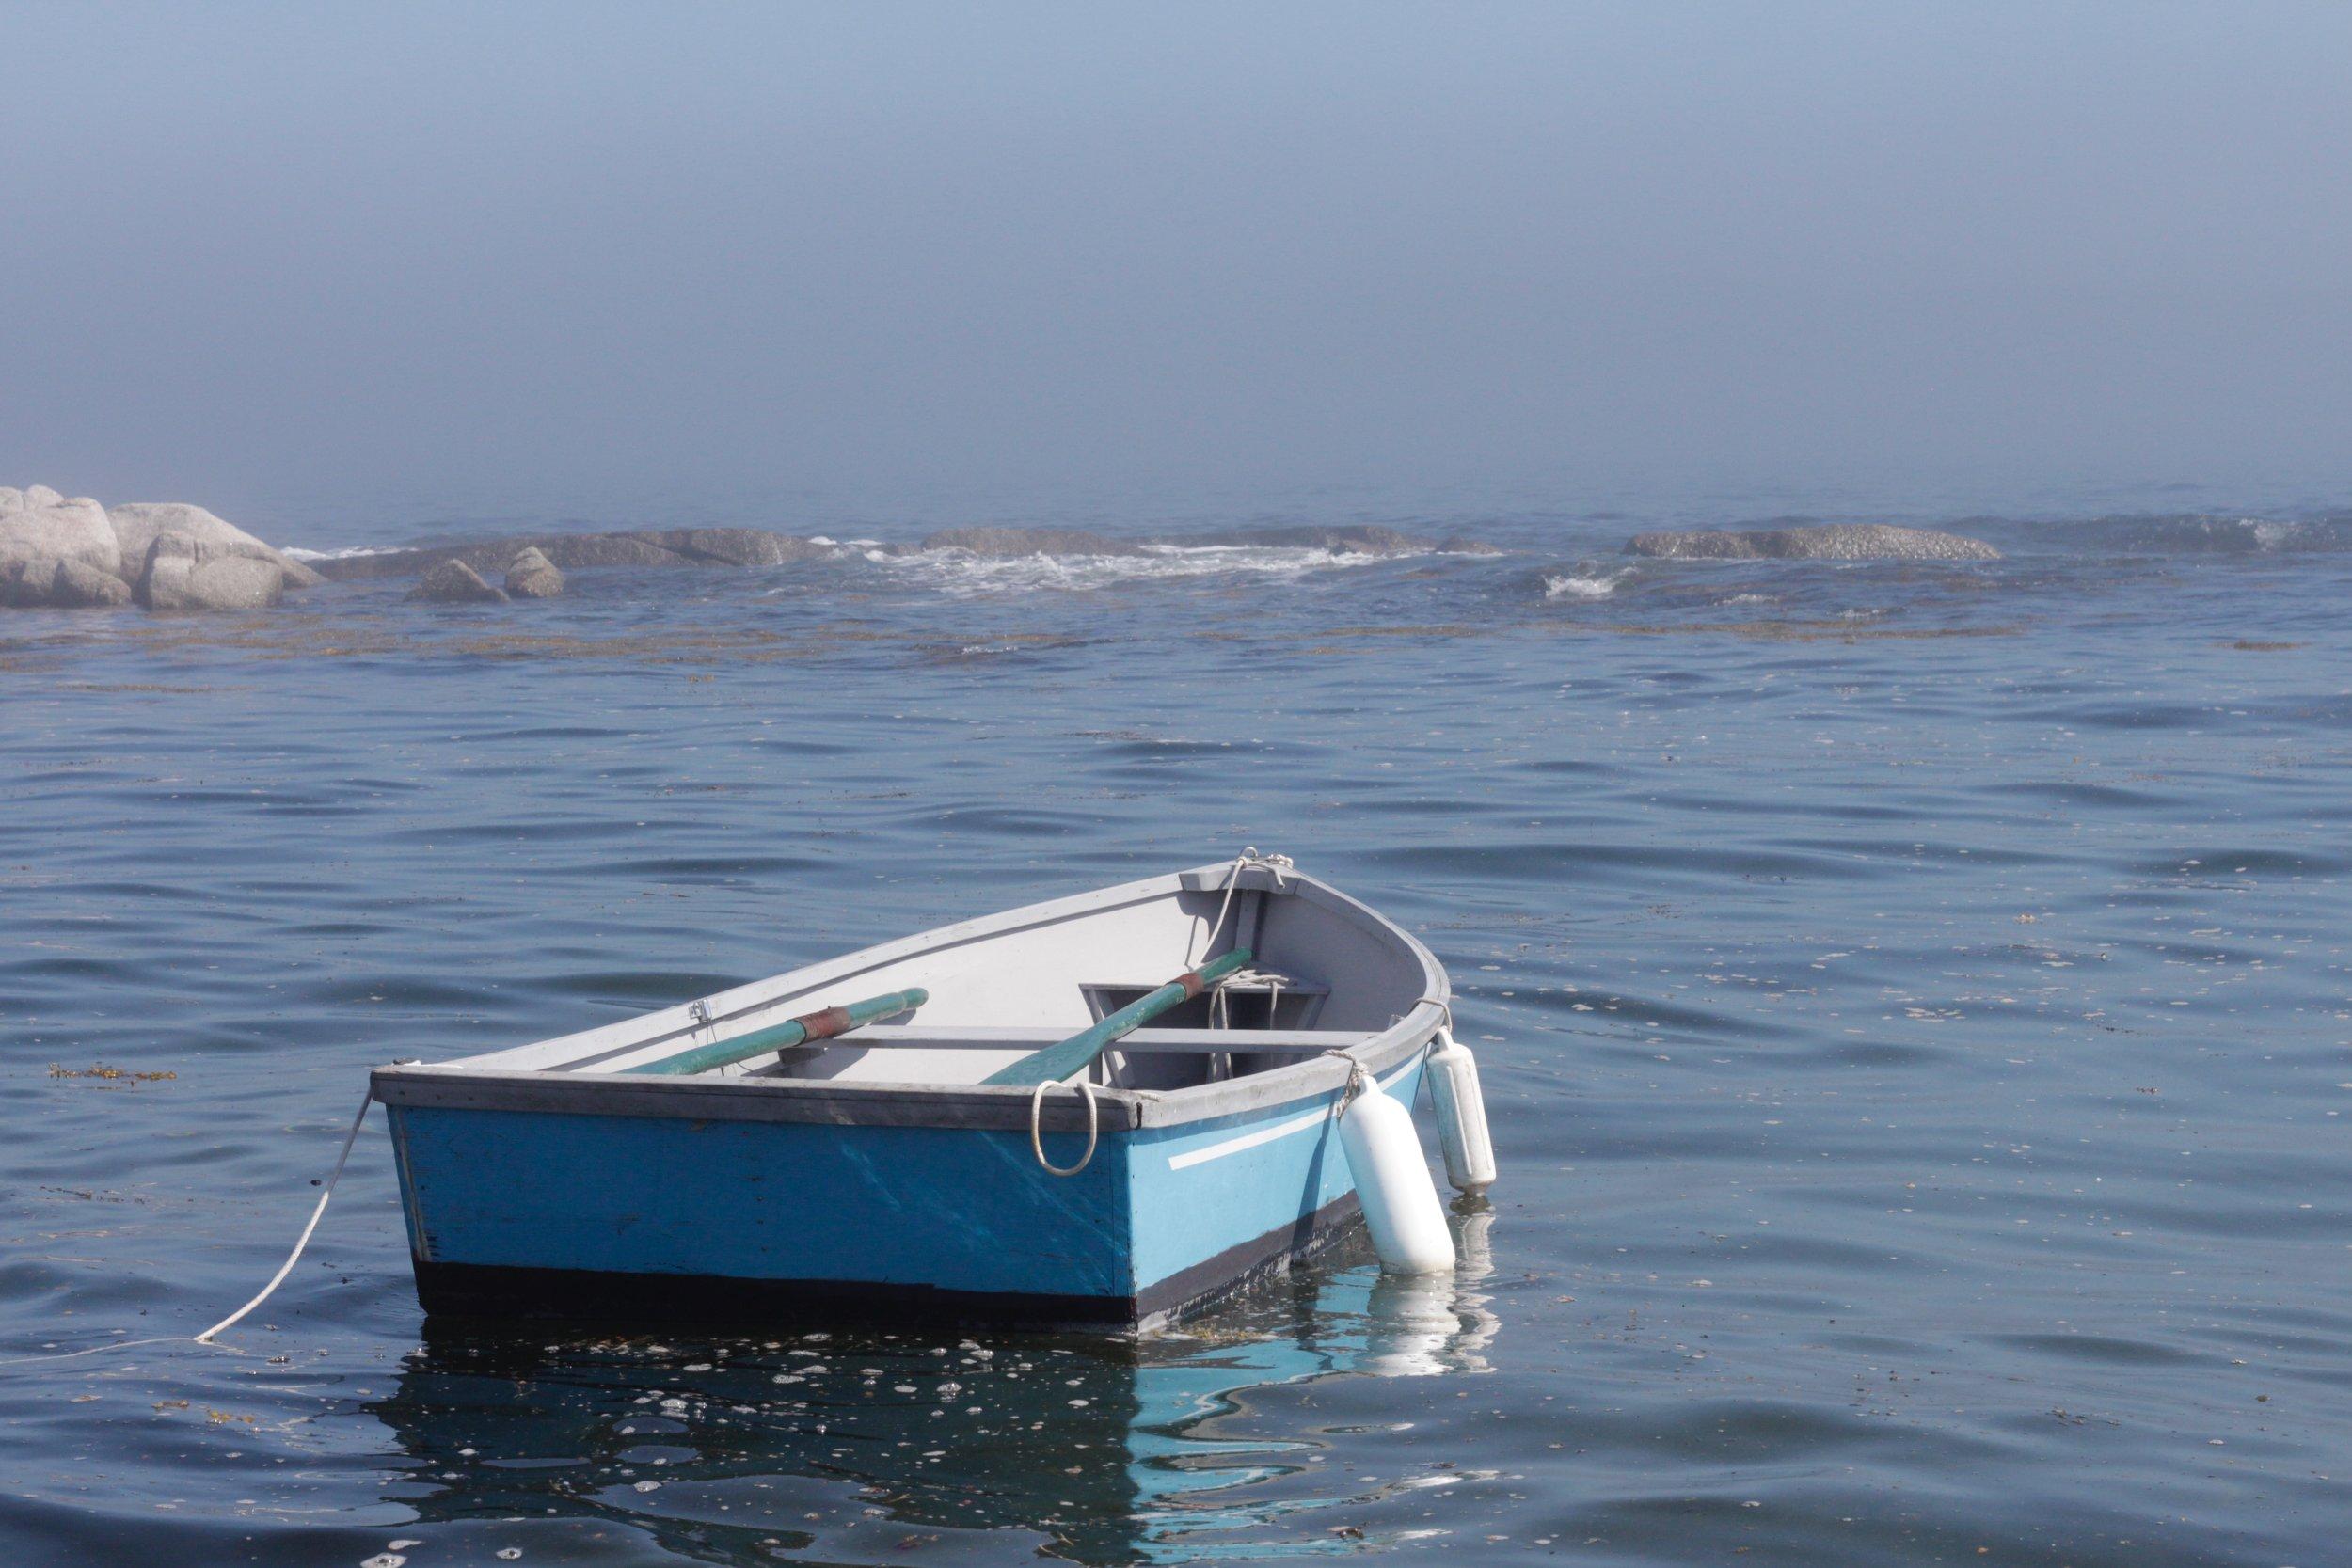 the skiff at Terence Bay